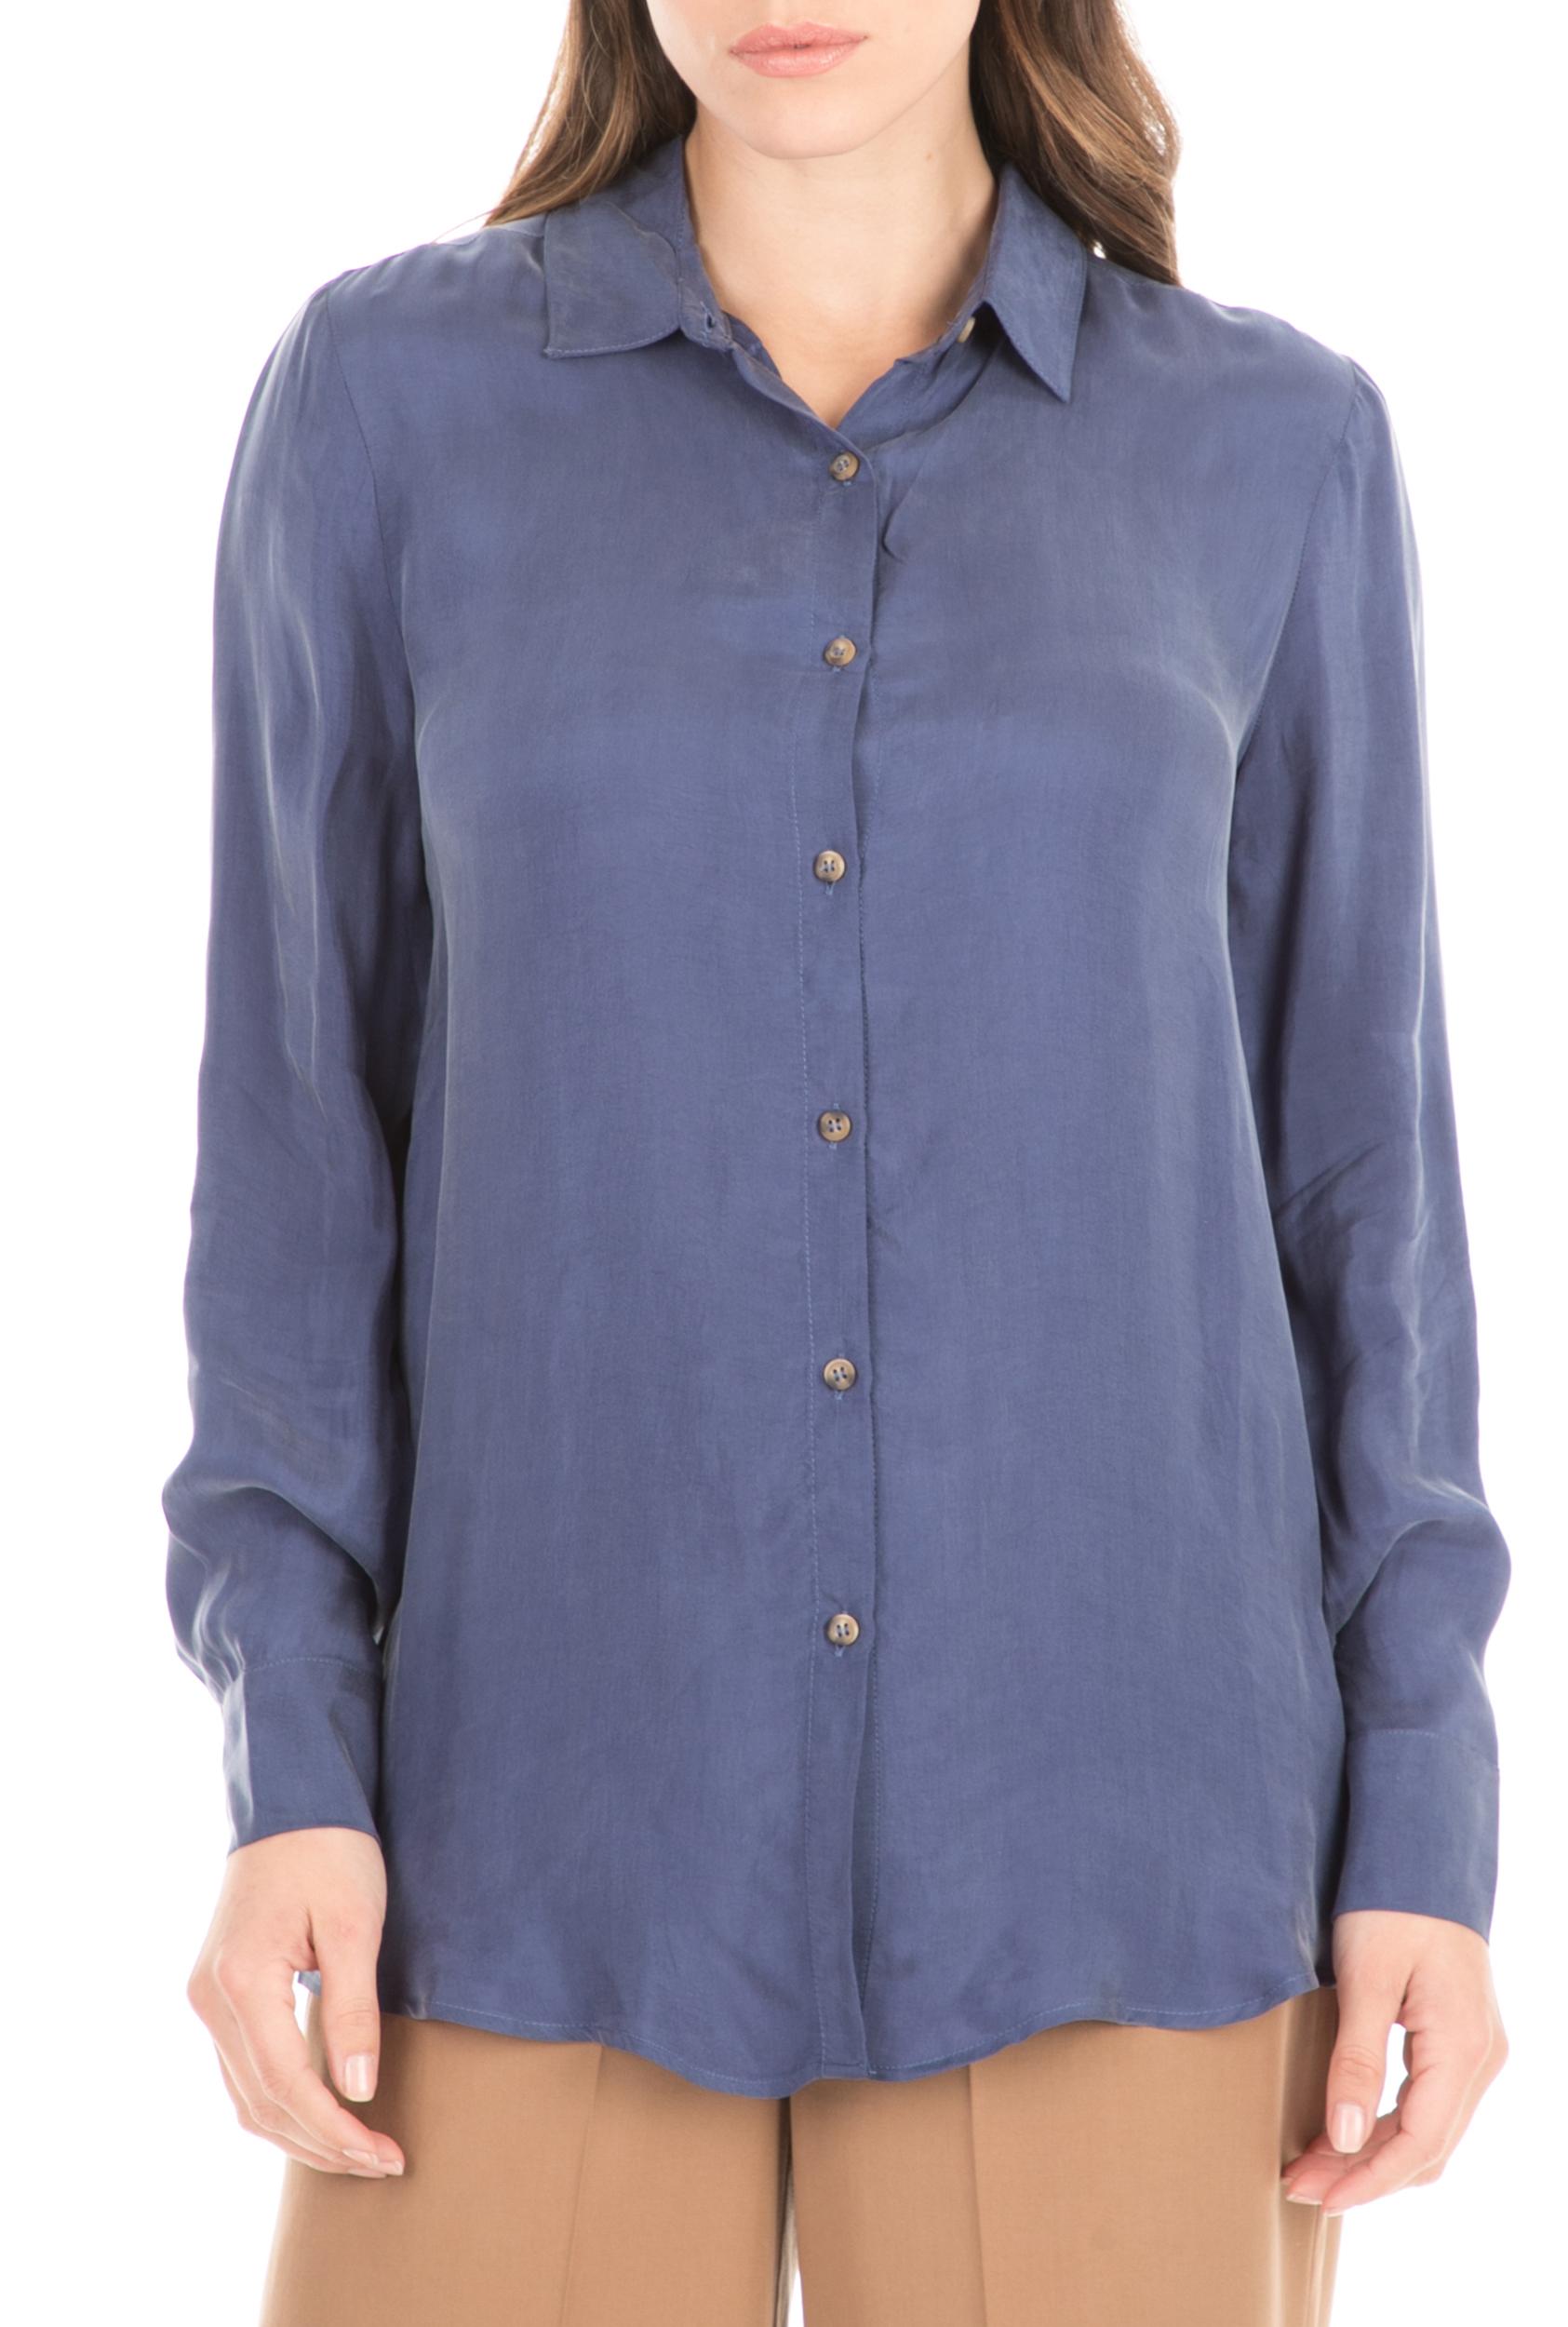 AMERICAN VINTAGE - Γυναικείο πουκάμισο AMERICAN VINTAGE μπλε γυναικεία ρούχα πουκάμισα μακρυμάνικα